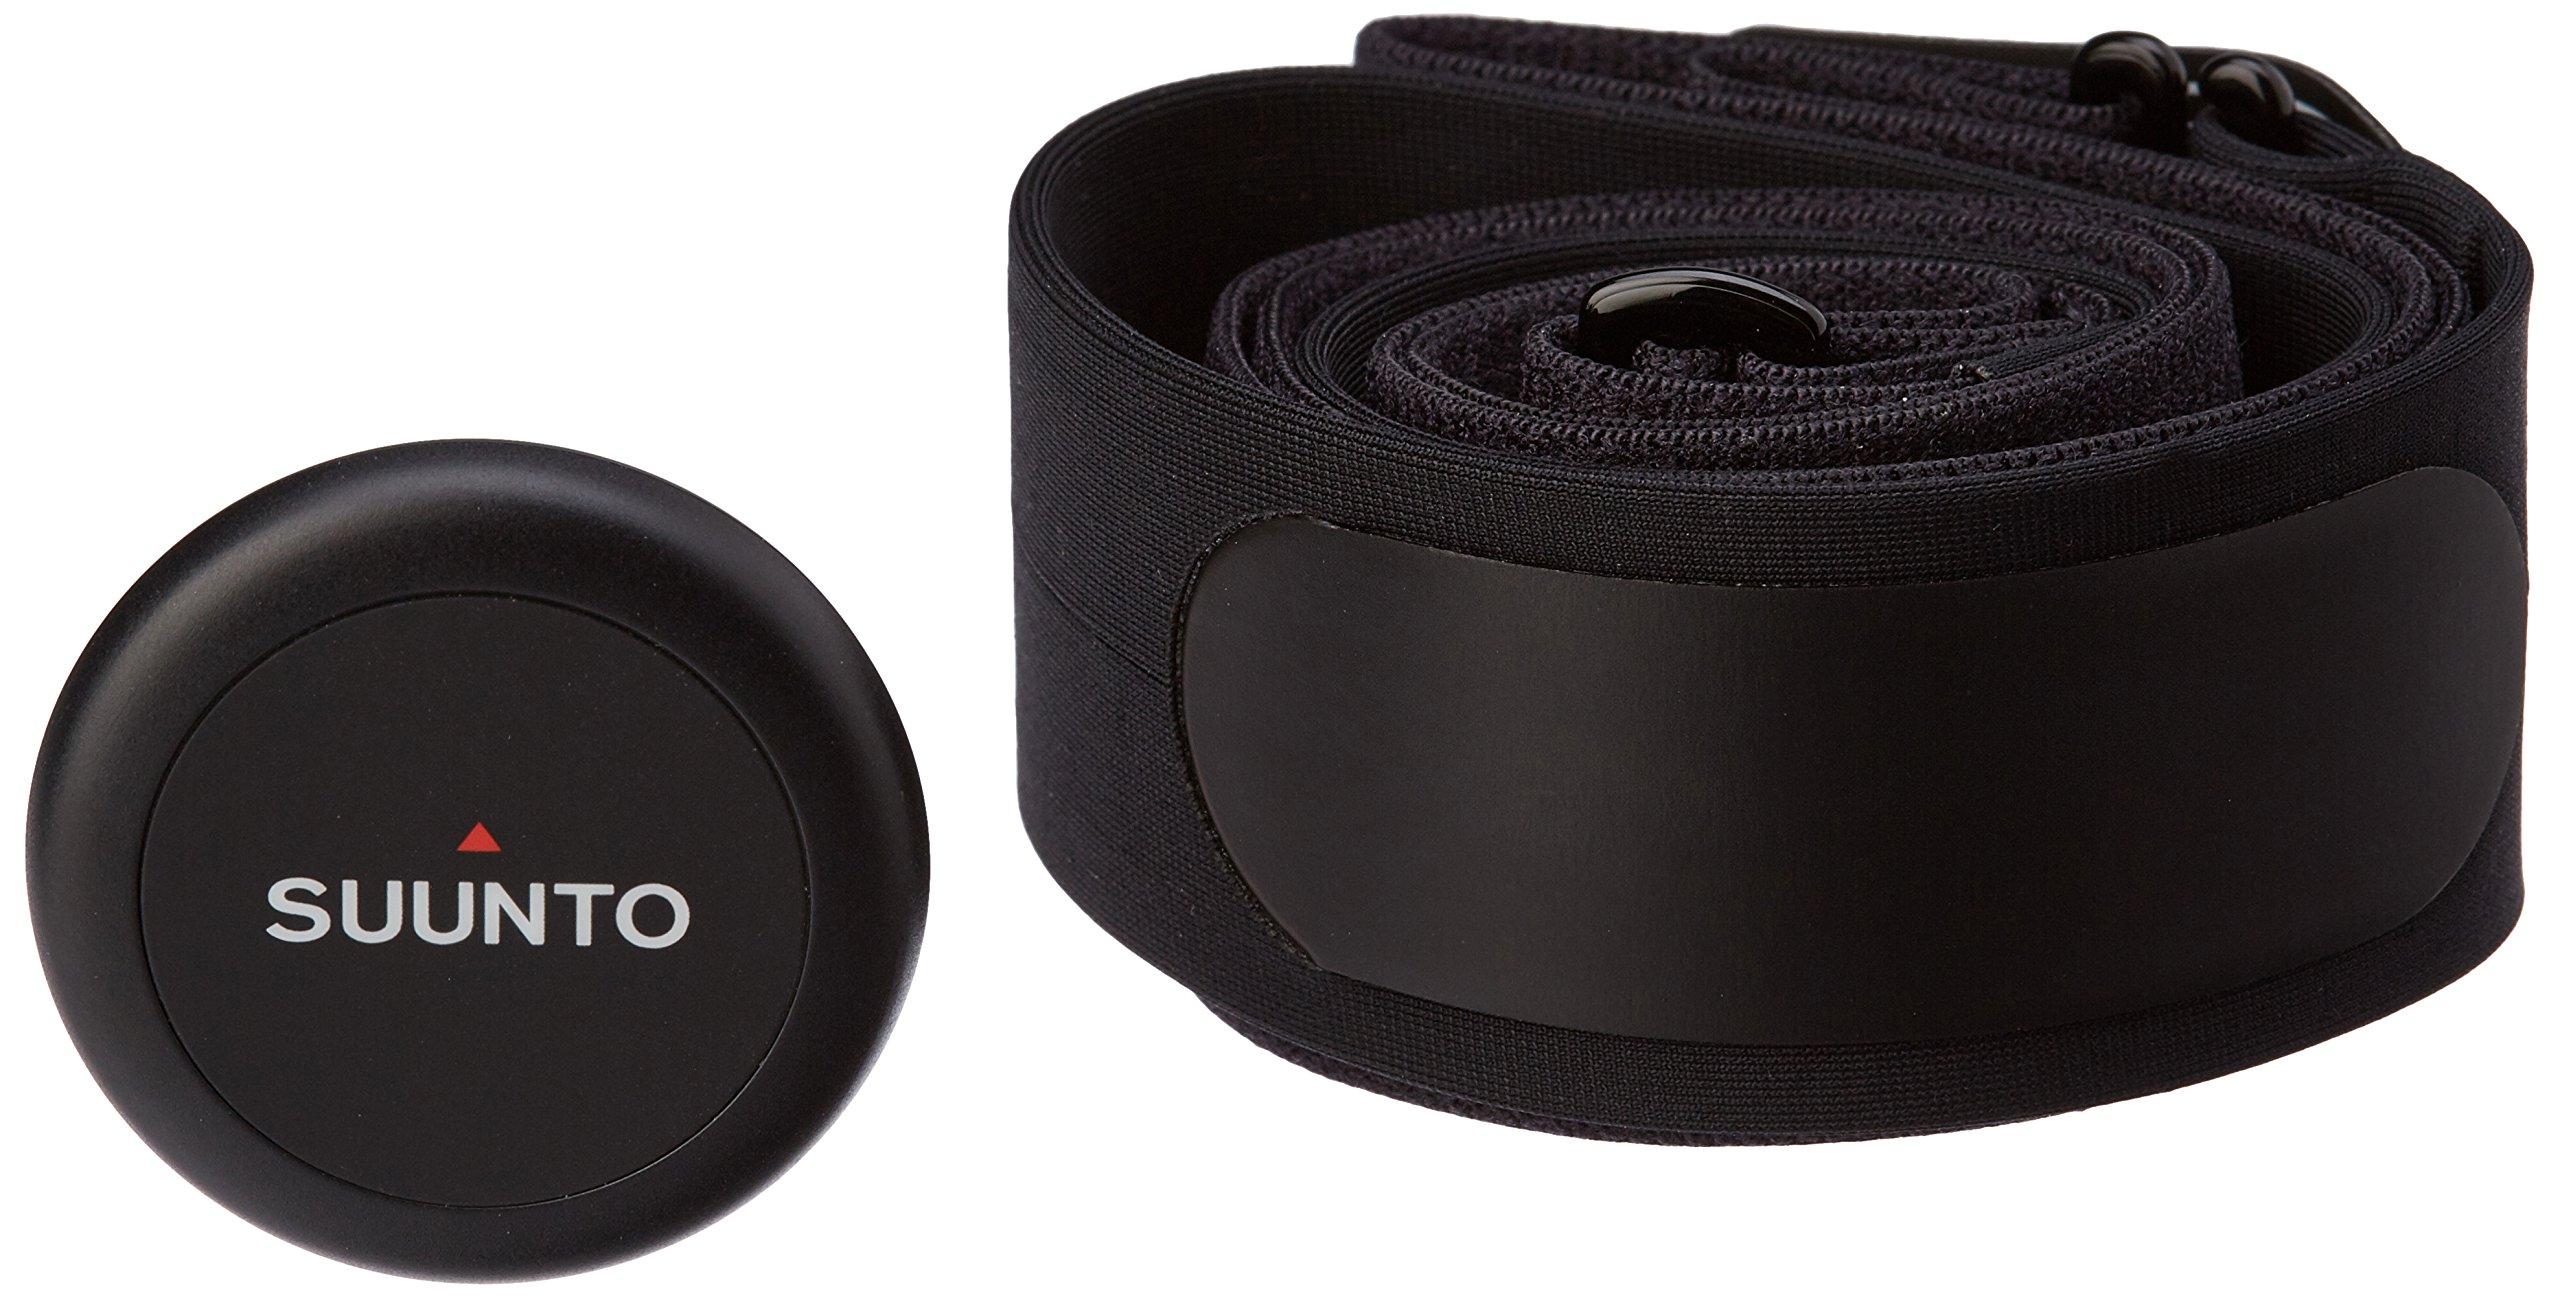 SUUNTO Smart Belt